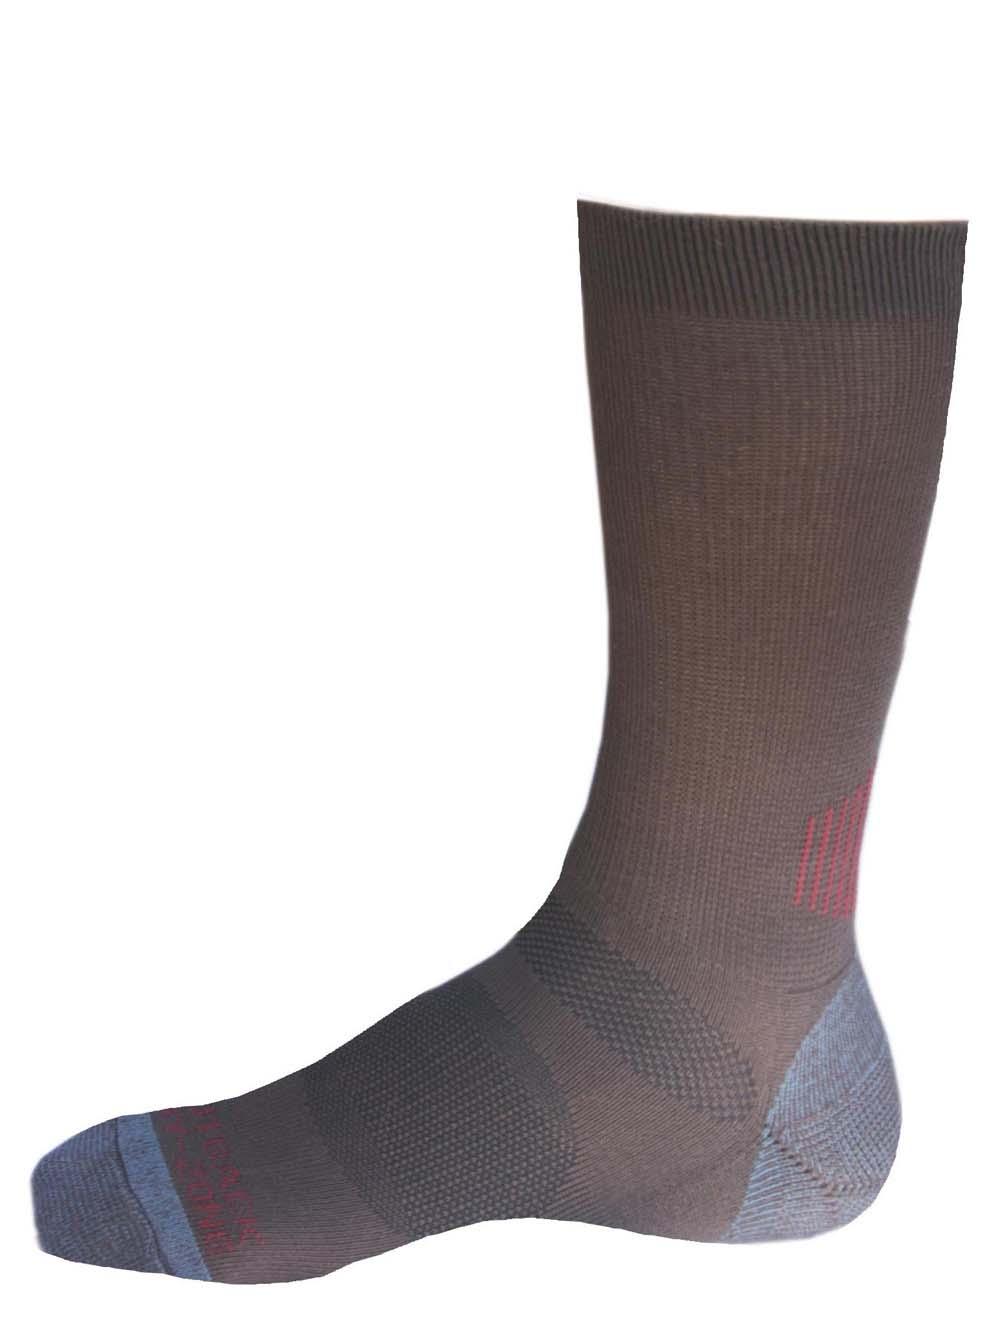 Outback Trading Mens Work Sock